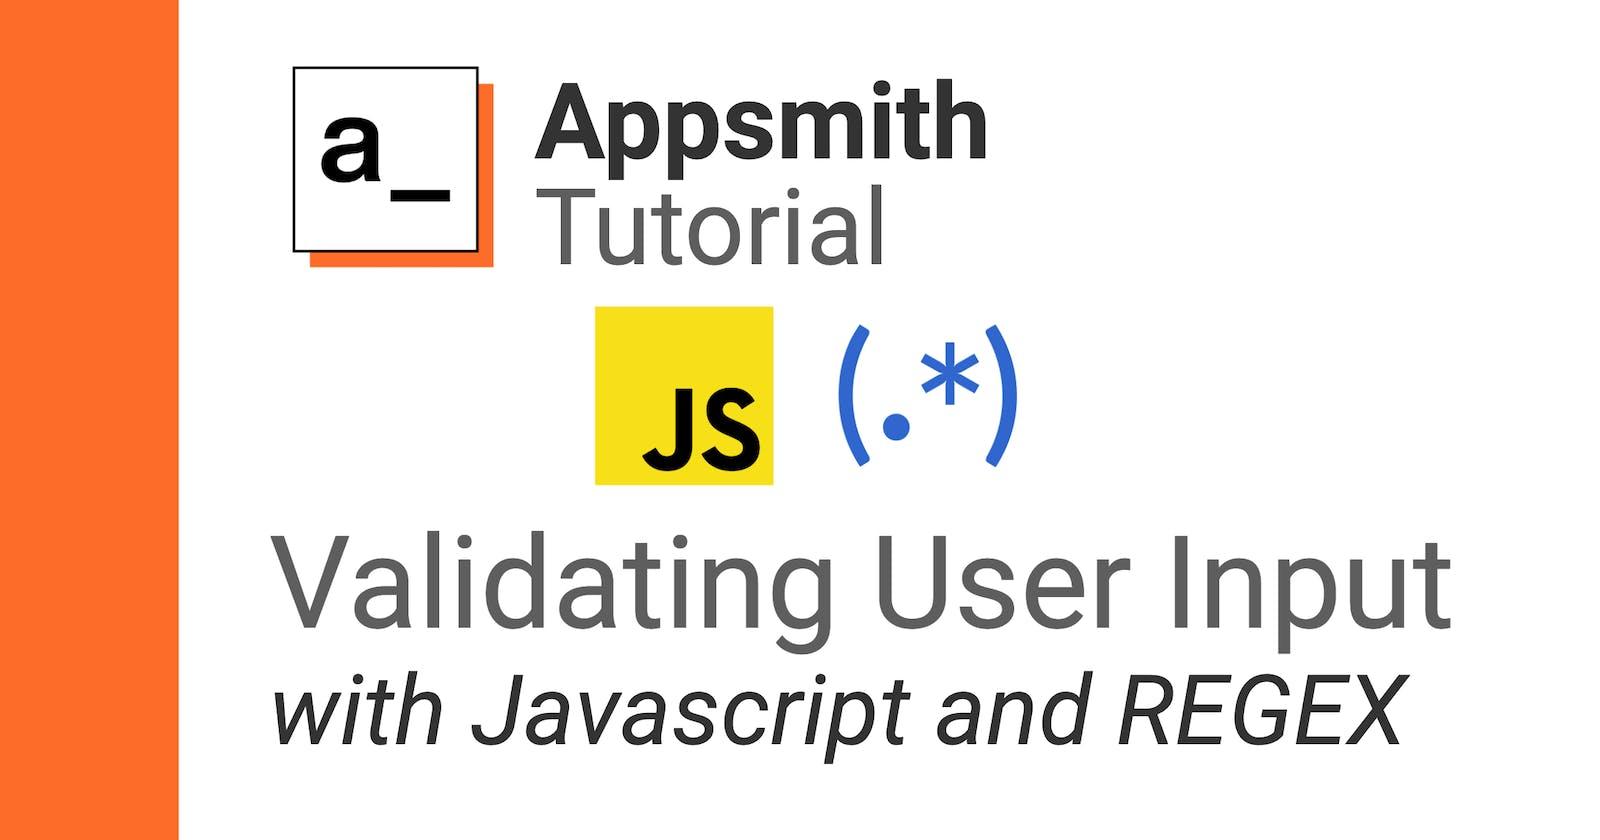 Appsmith Tutorial: Validating User Input